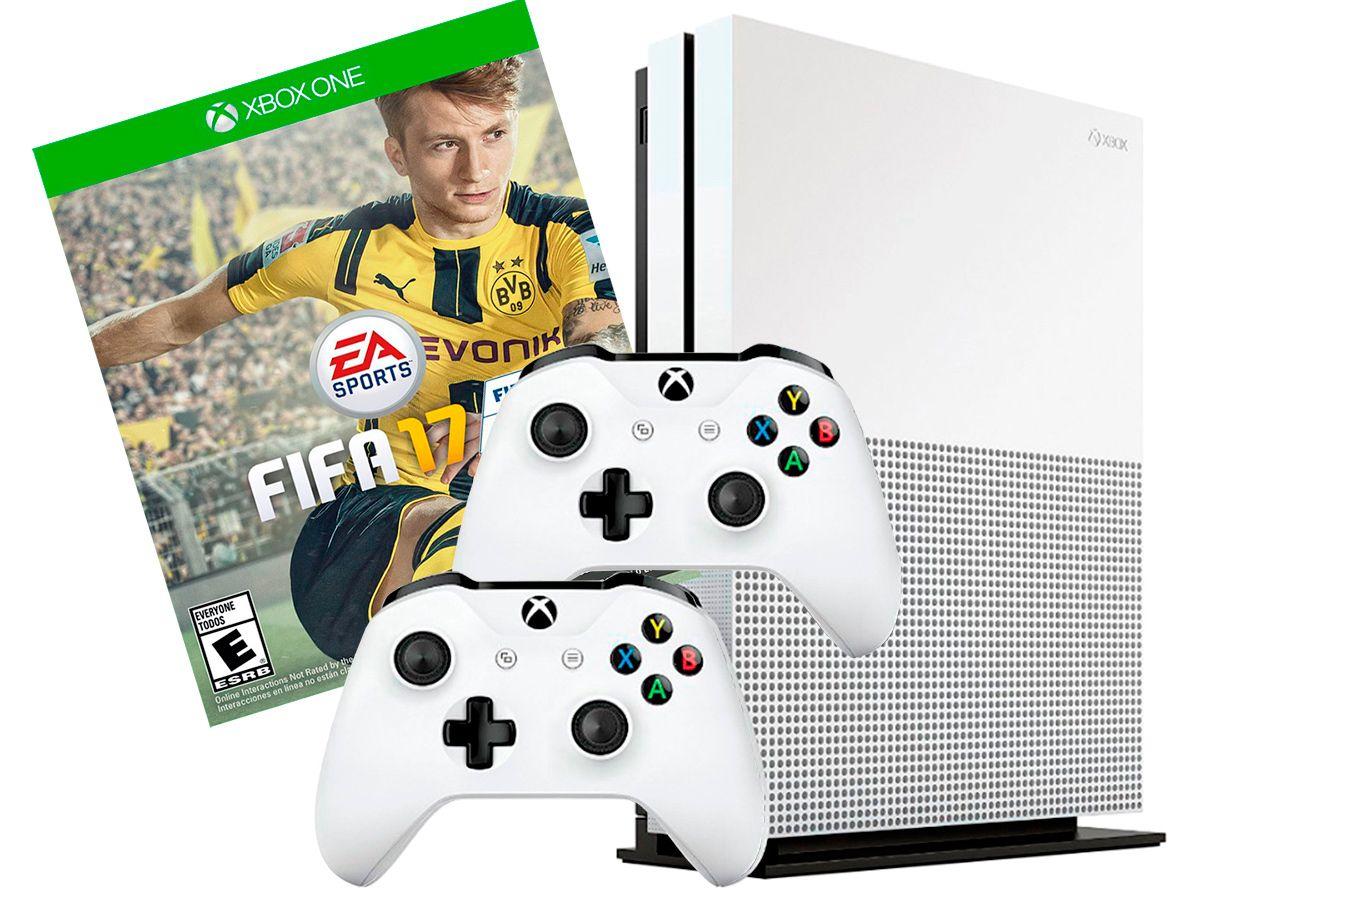 Xbox One S 1Tb 2 джойстика, FIFA 17 и игровая приставка  [SXO1F2]